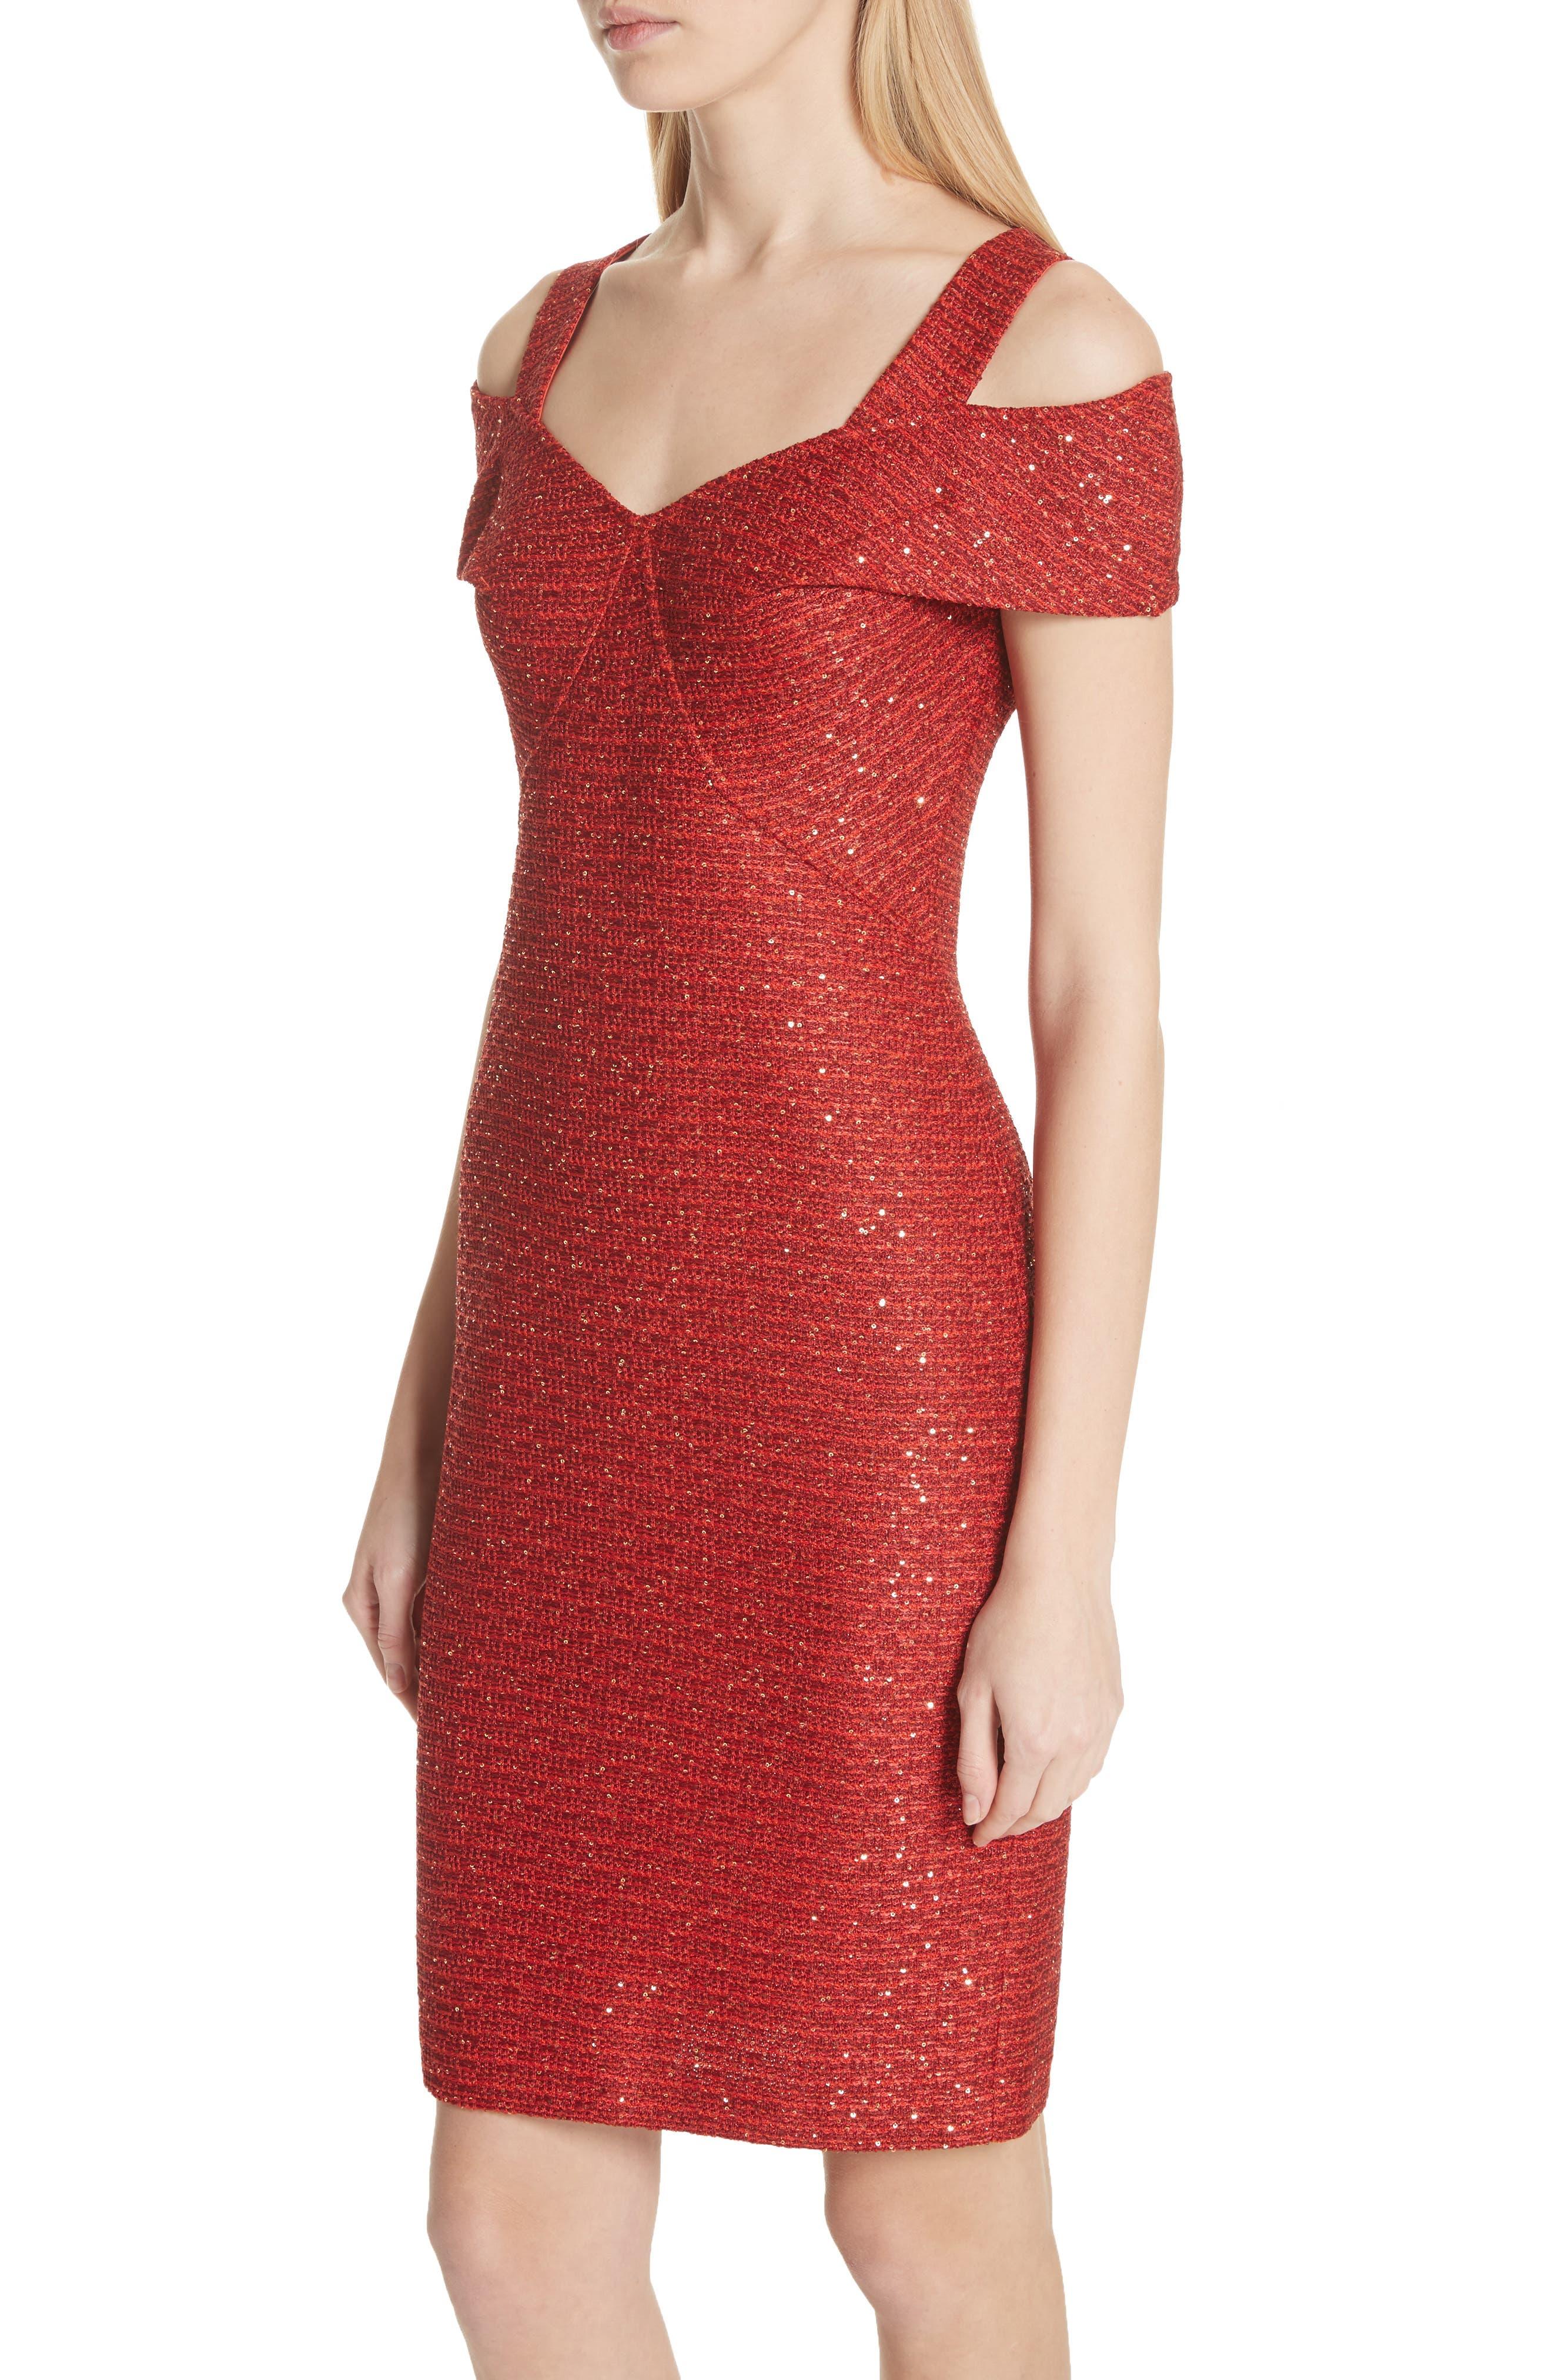 Glamour Sequin Knit Cold Shoulder Dress,                             Alternate thumbnail 4, color,                             Sienna Multi